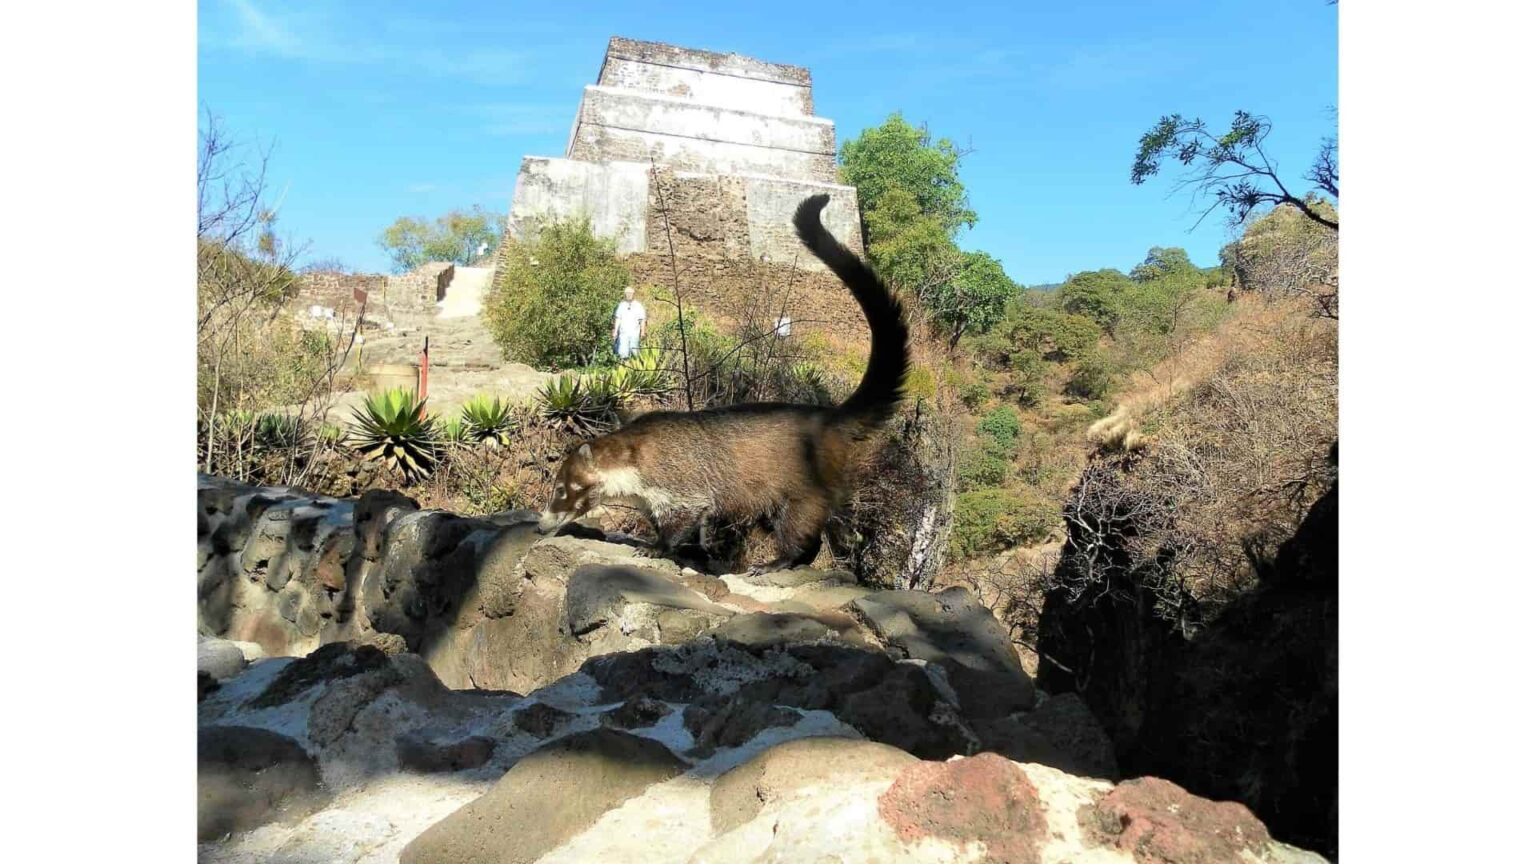 galerie photos voyage Mexique , coati dans les ruines du Tepozteco